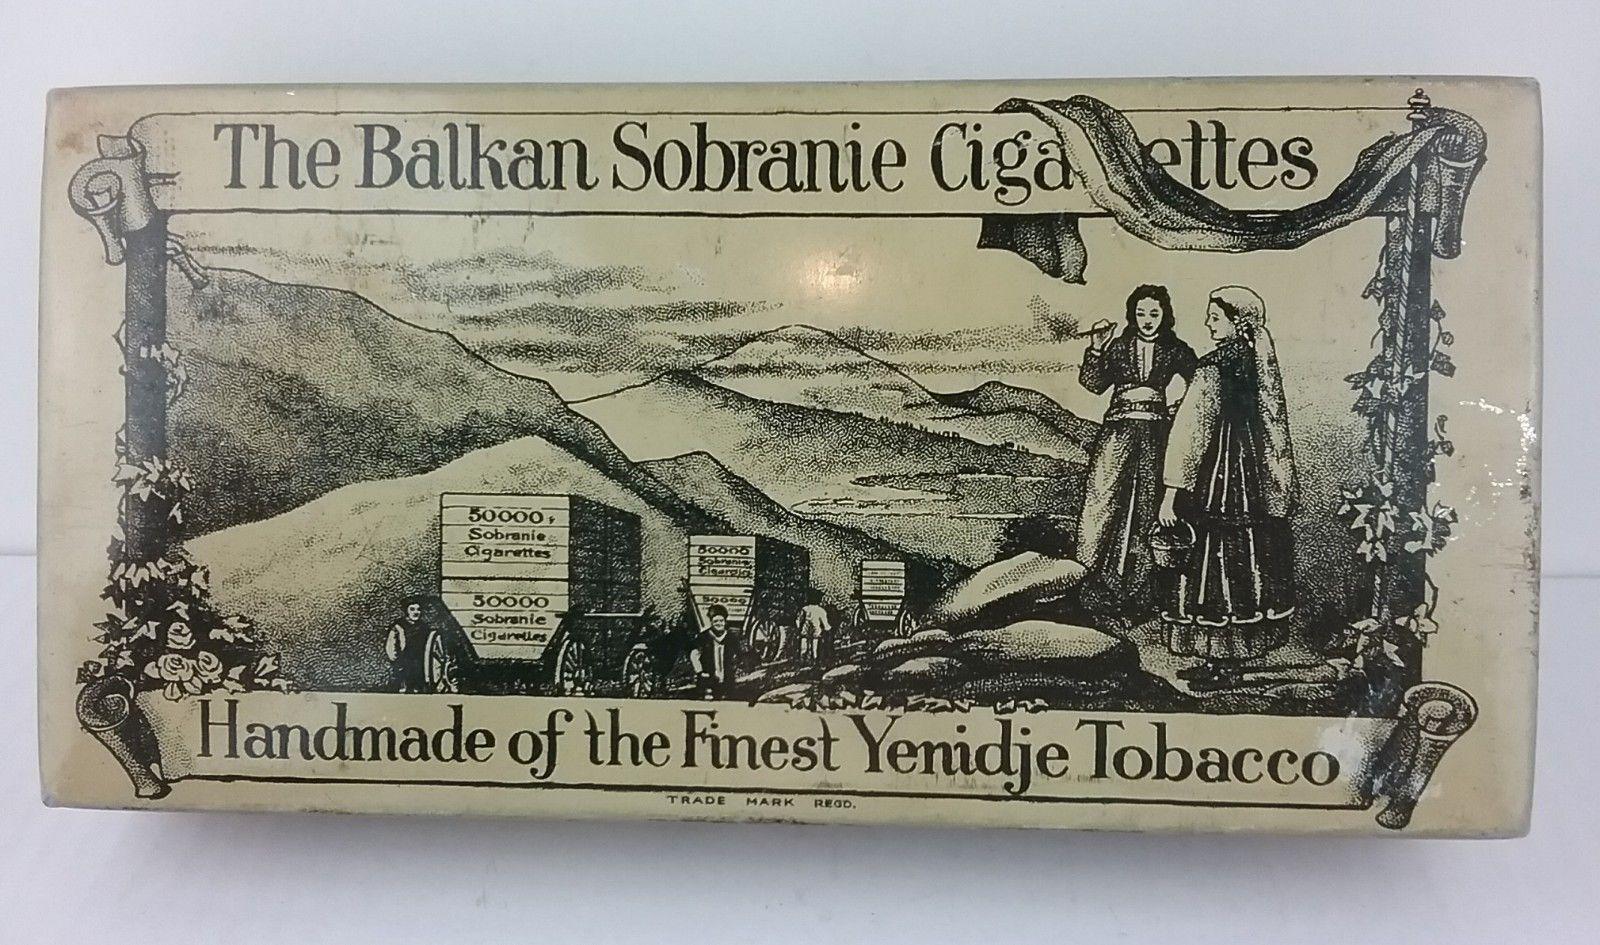 THE BALKAN SOBRANIE. SOBRANIE OF LONDON Antiqu10